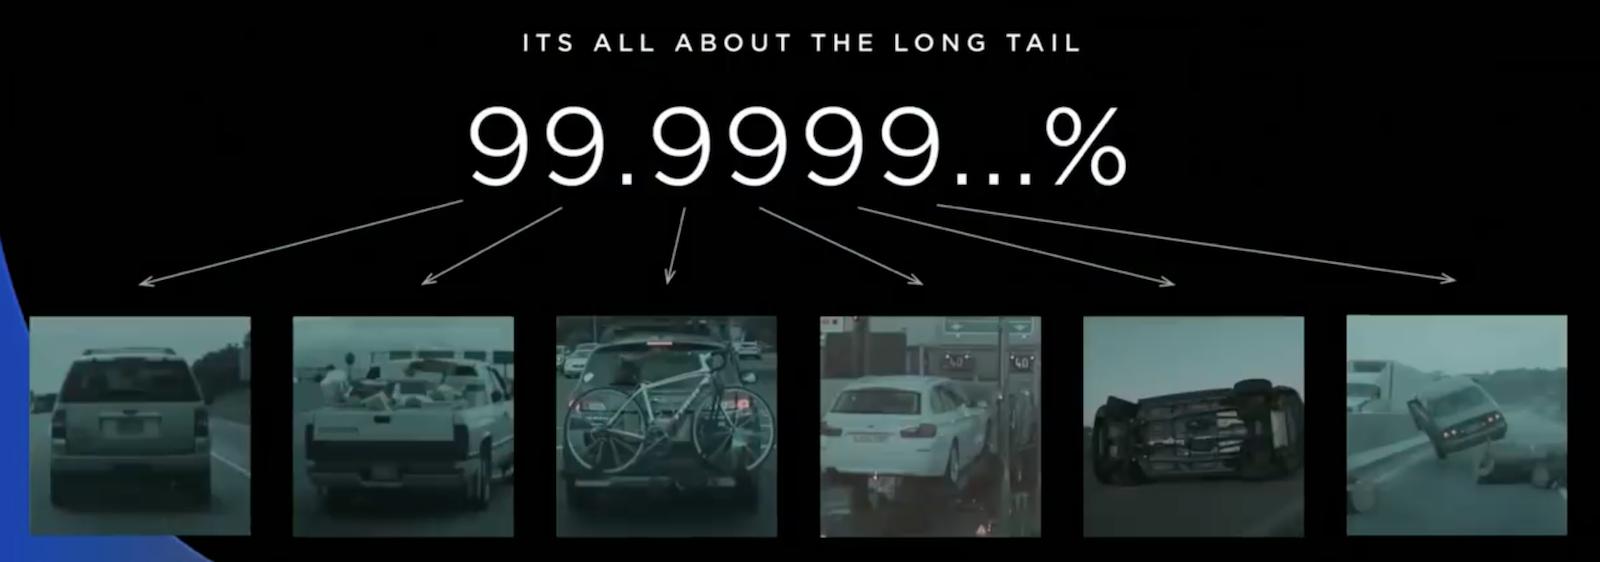 Does Tesla Still Have An Edge? - Tesla, Inc  (NASDAQ:TSLA